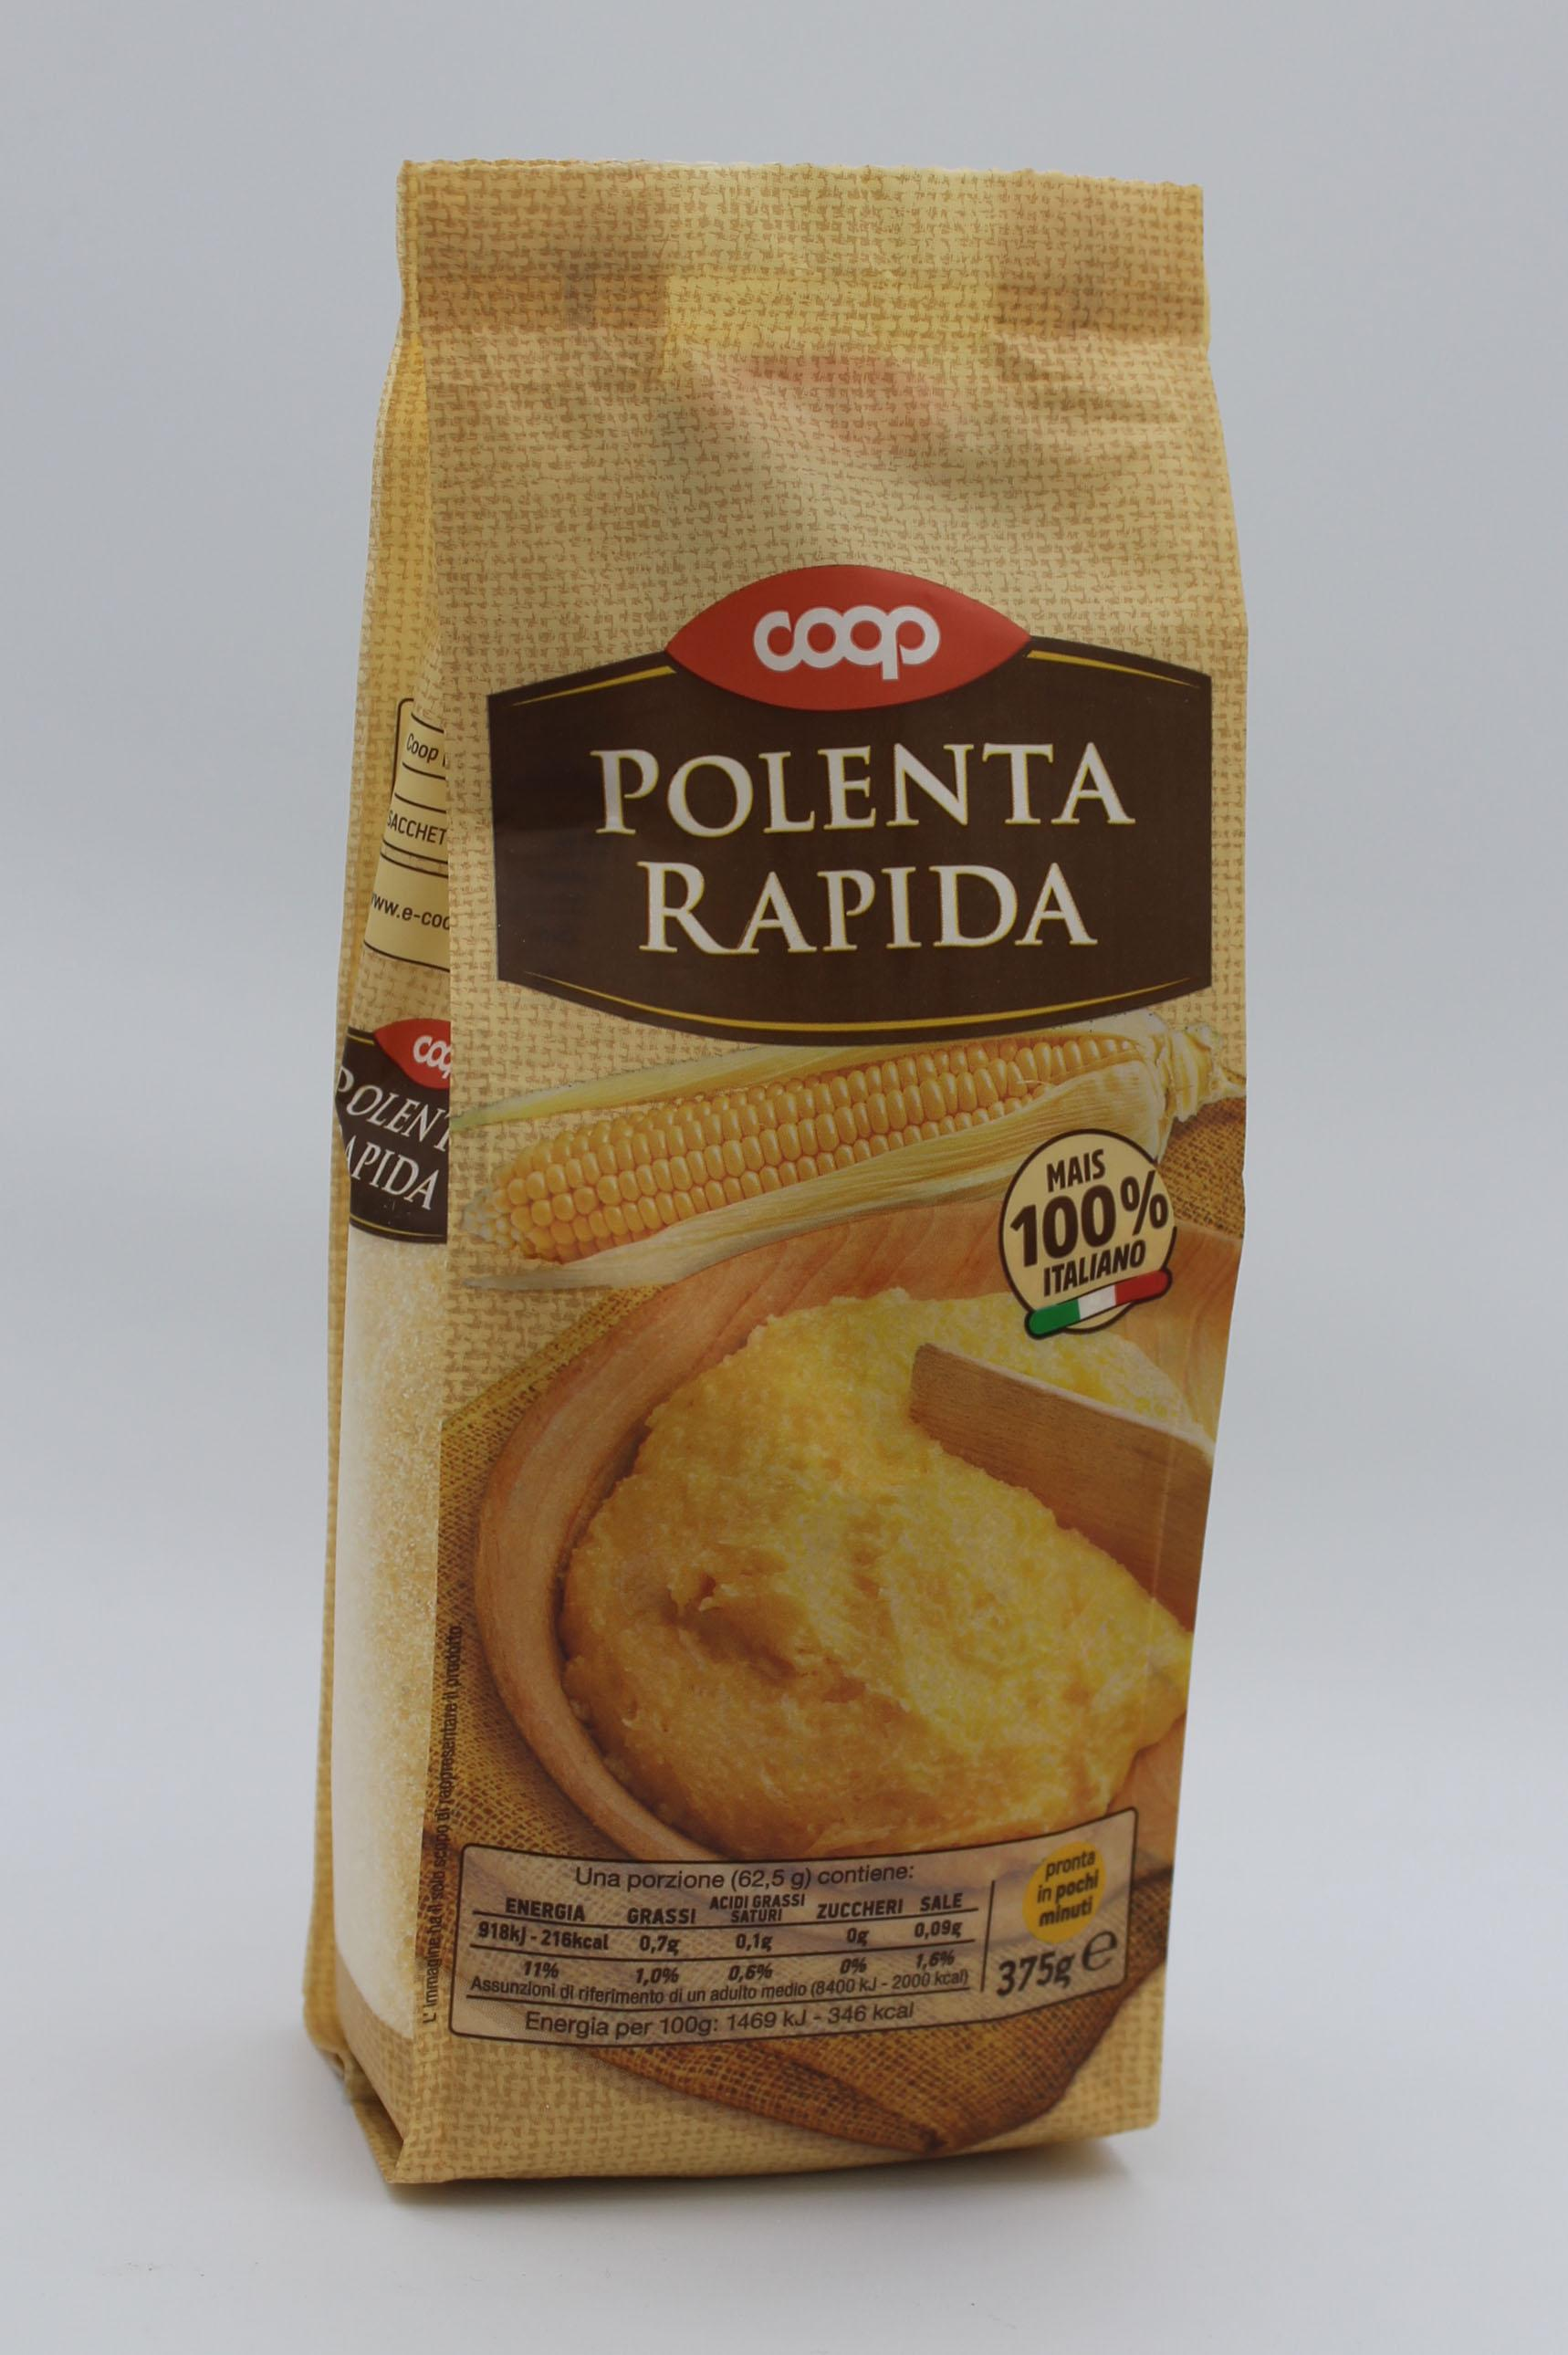 Coop polenta rapida 375gr.